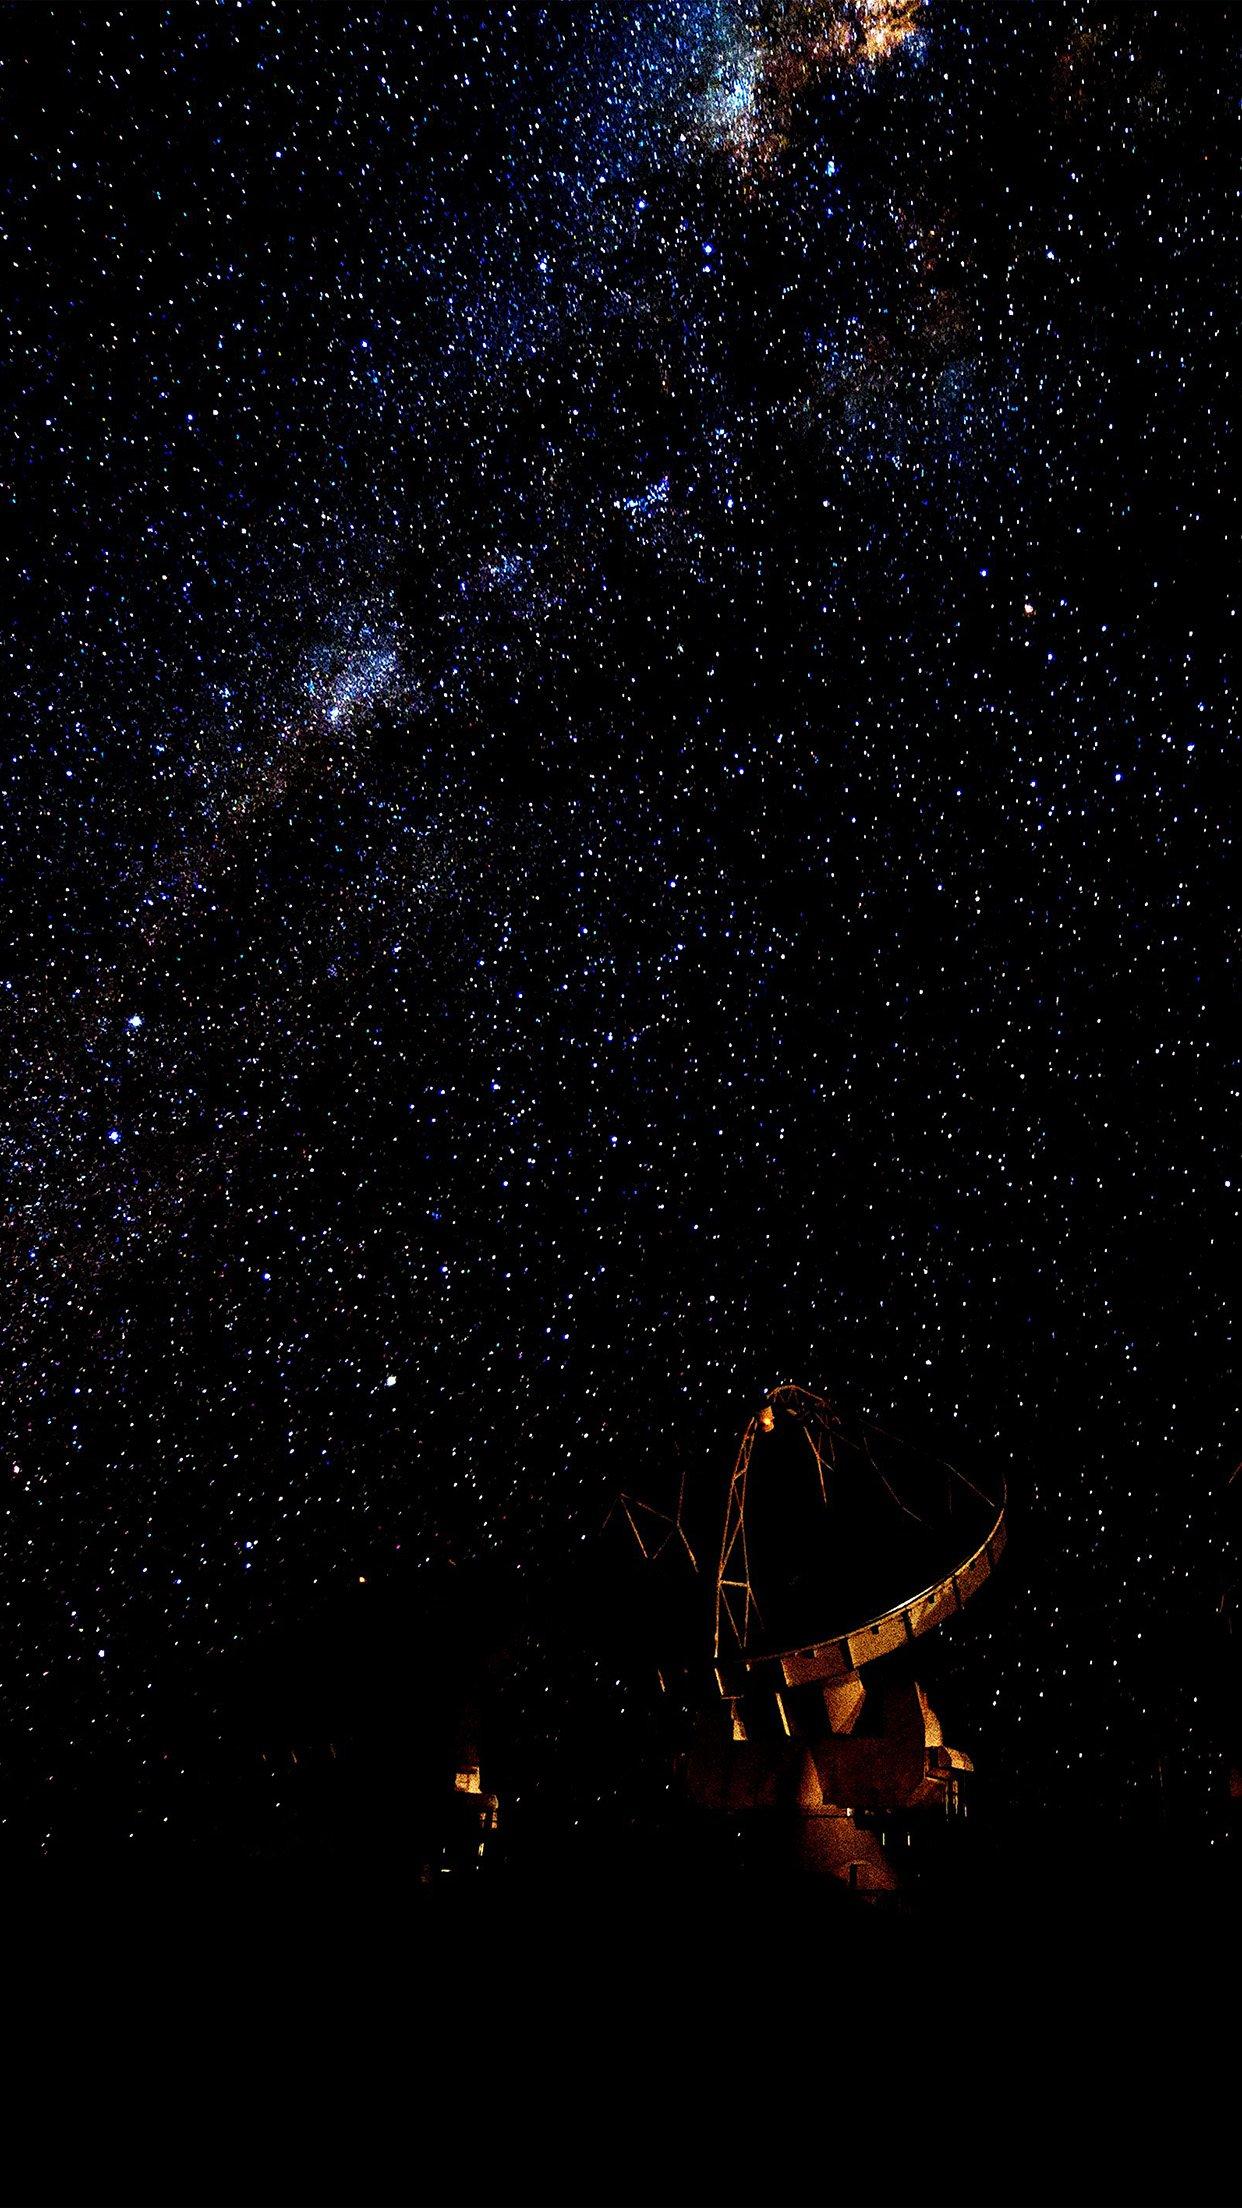 space dark star nature black sky android wallpaper